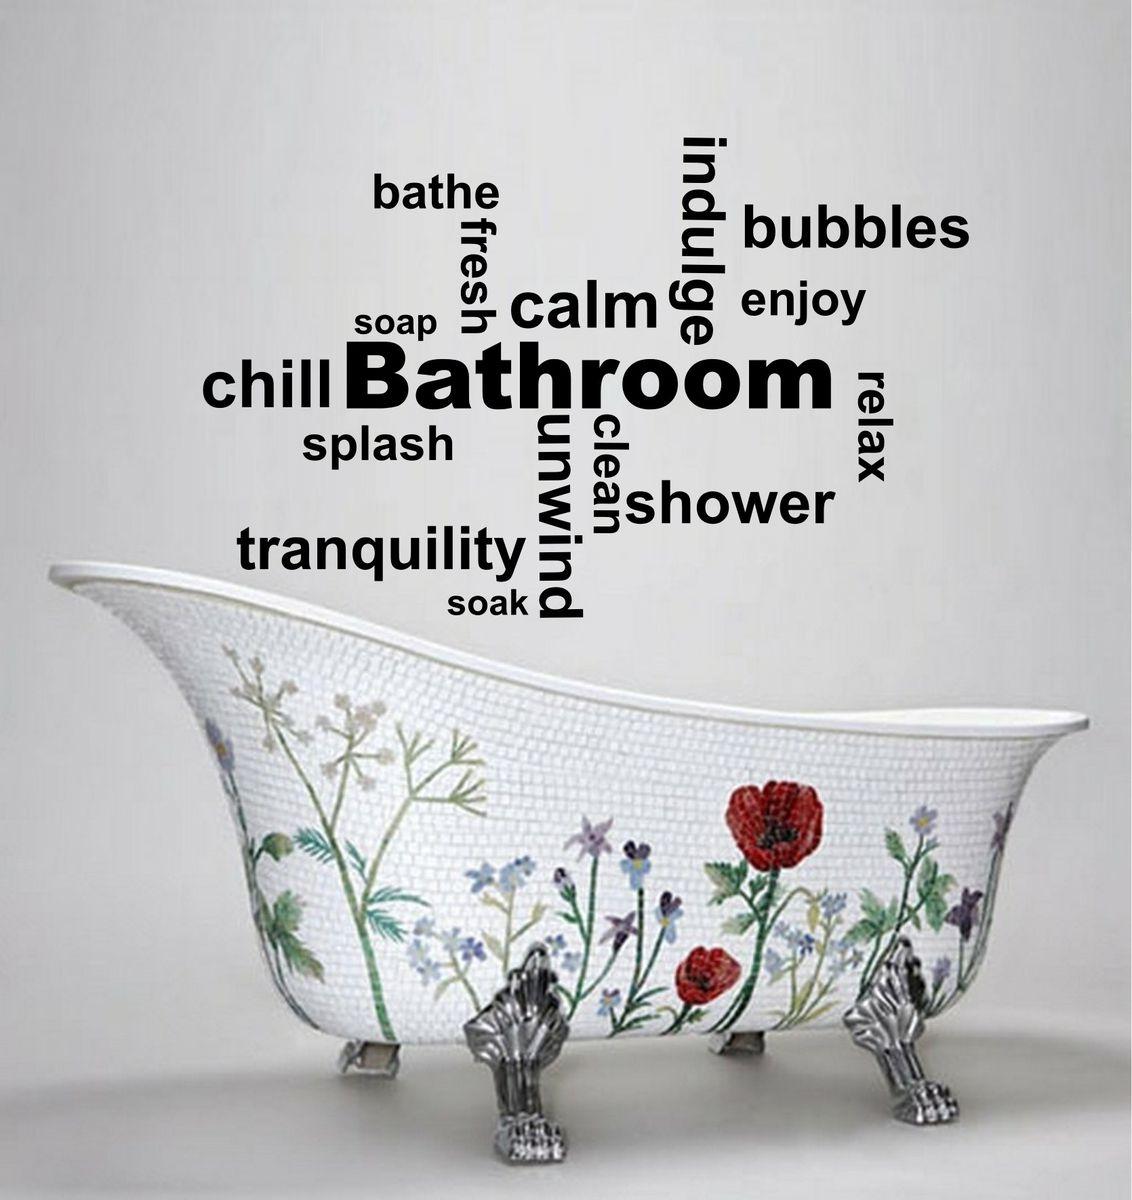 Vinyl Lady Bathroom Inspirational Words Wall Art Stickers   Black